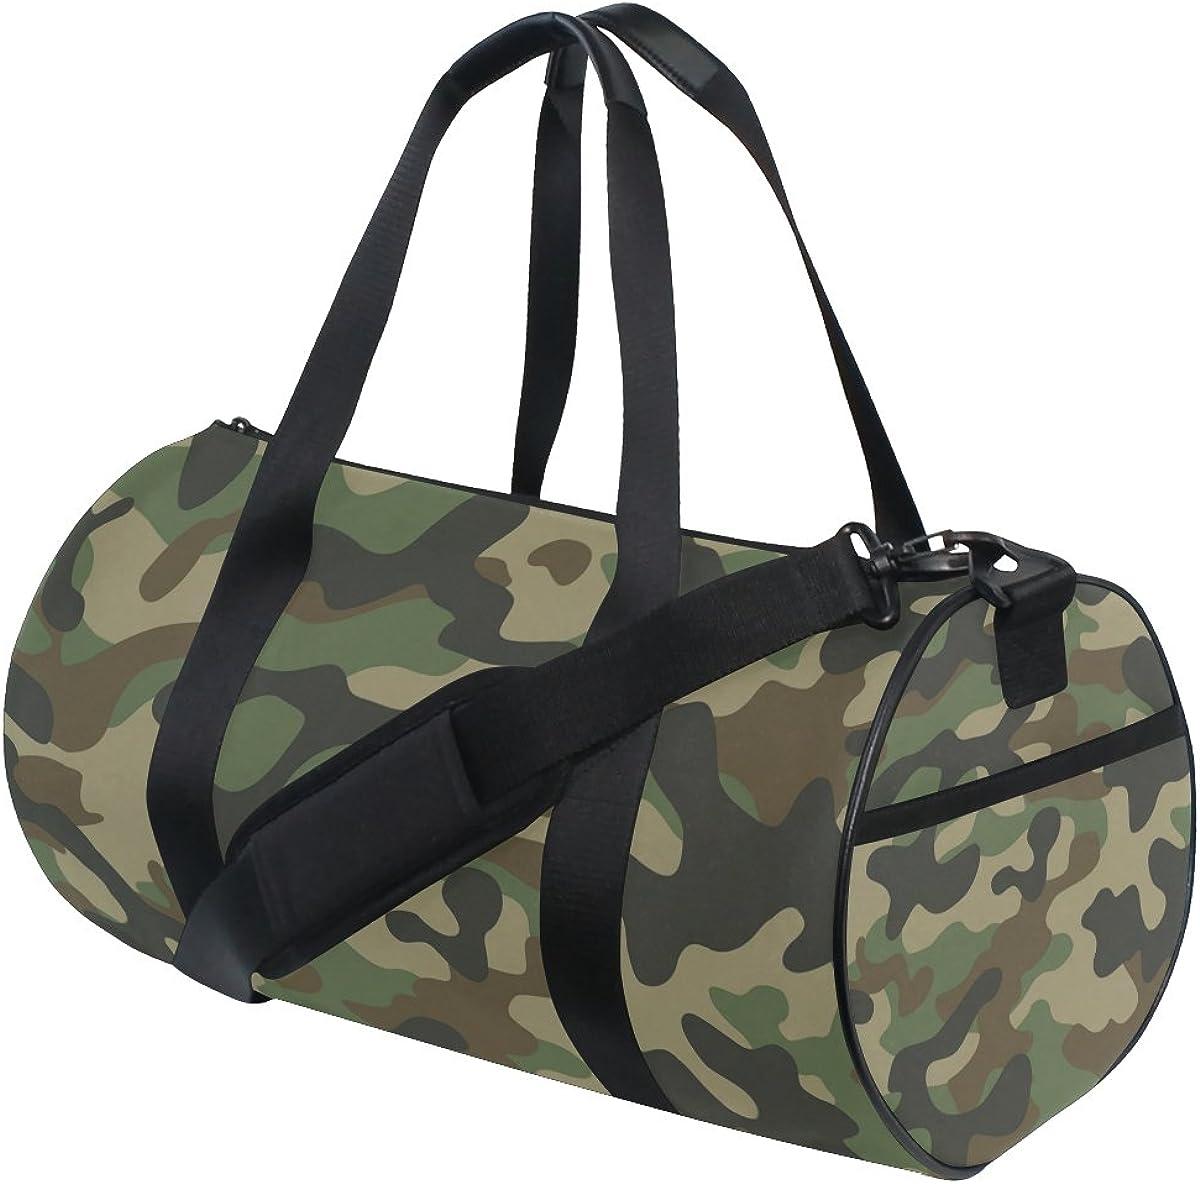 ALAZA Stylish Military Camouflage Sports Gym Duffel Bag Travel Luggage Handbag for Men Women